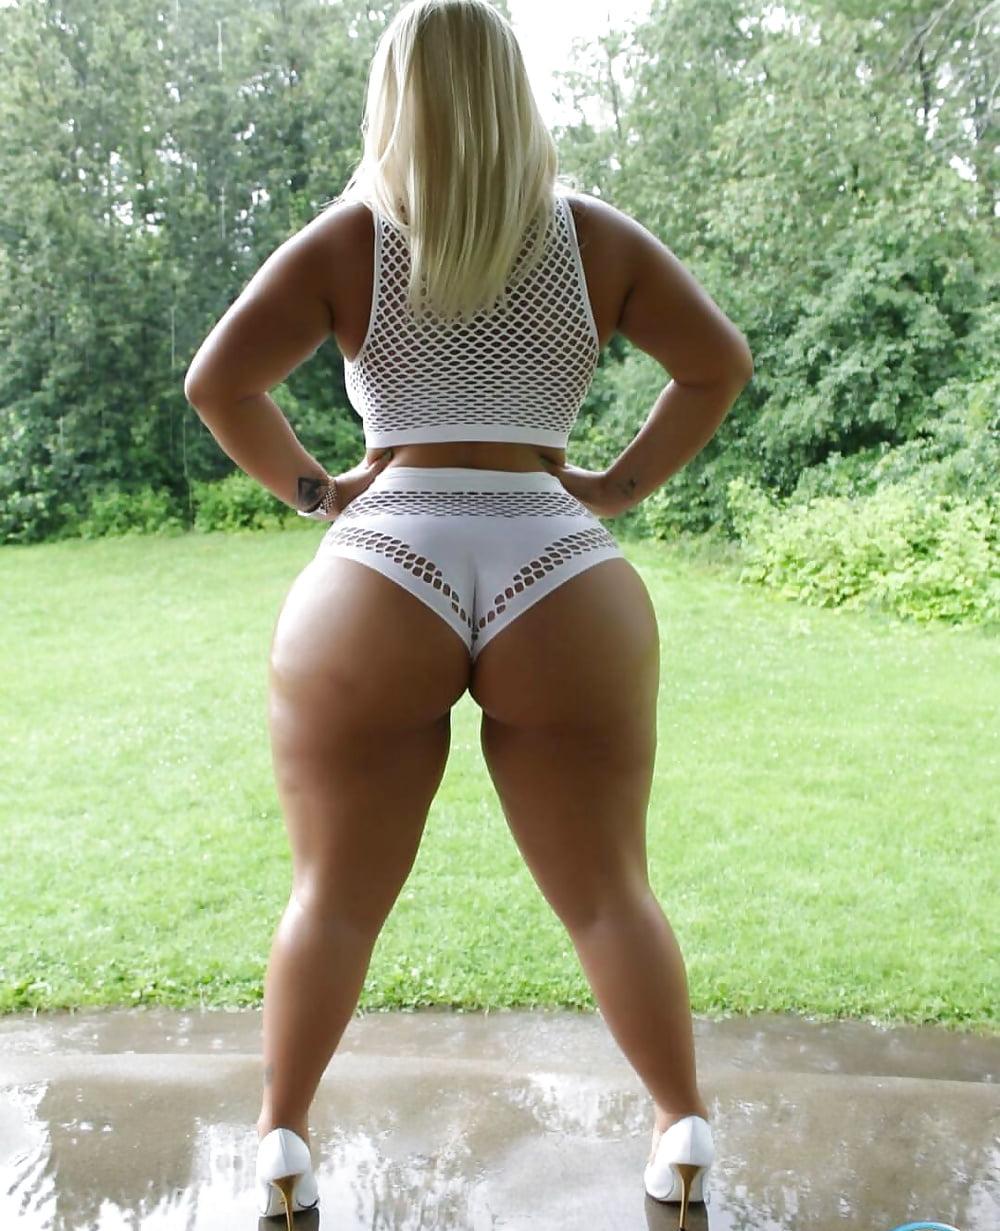 Thick ass white women